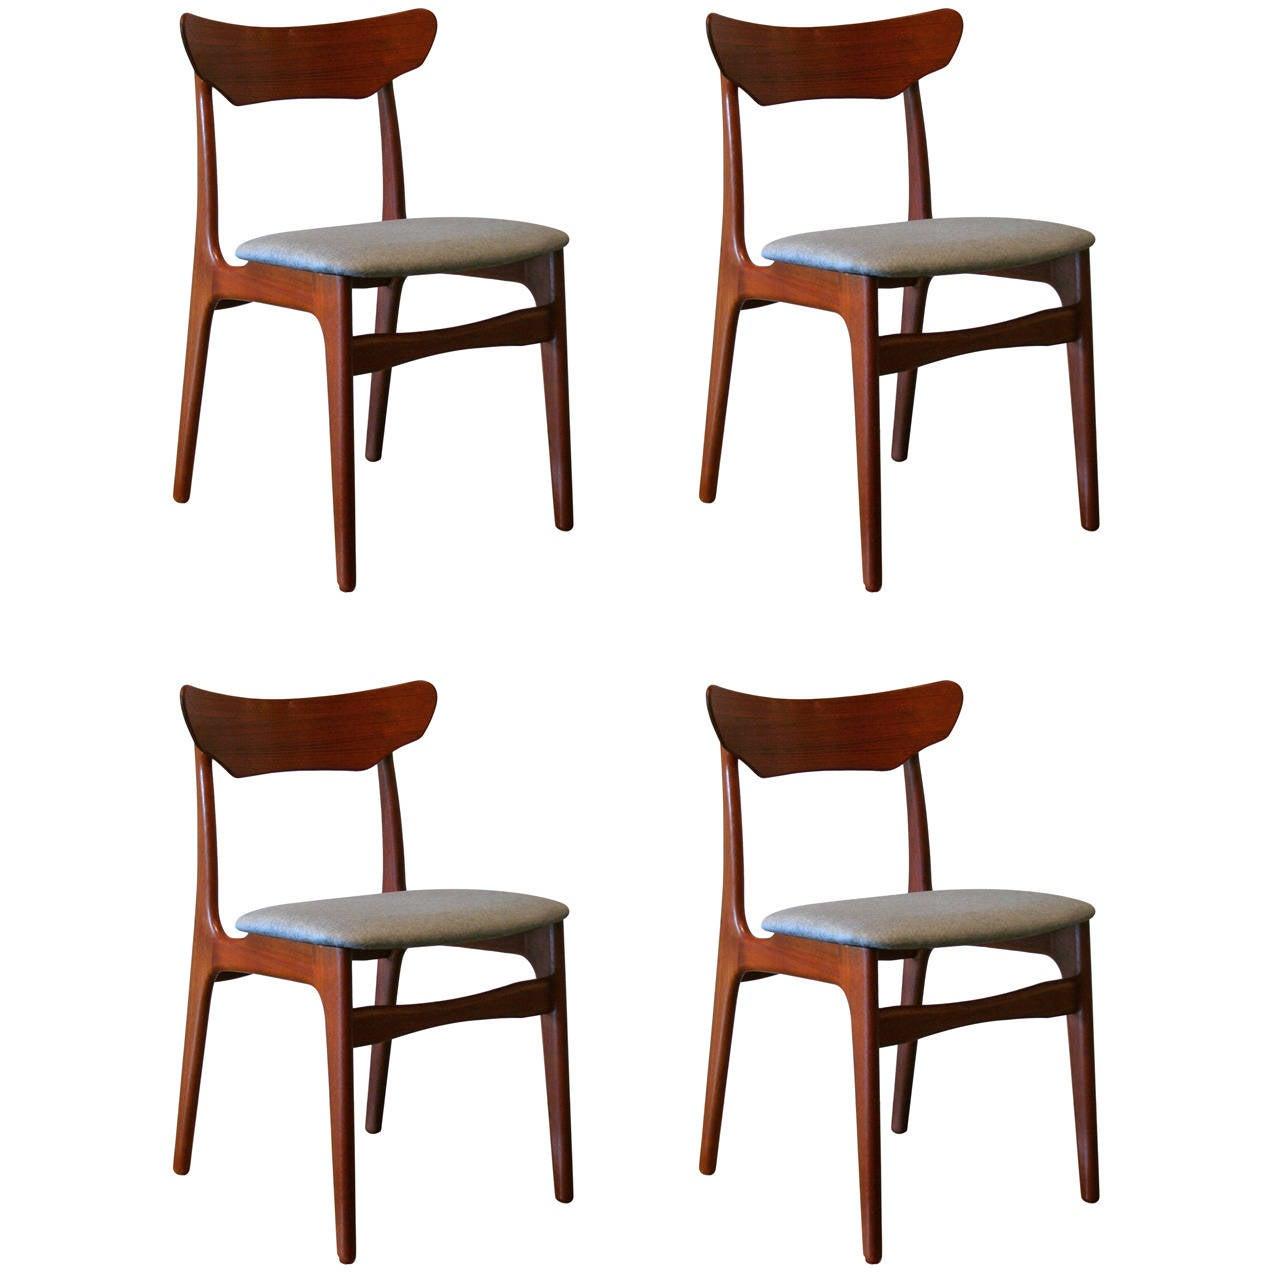 Vintage danish teak dining chairs at stdibs